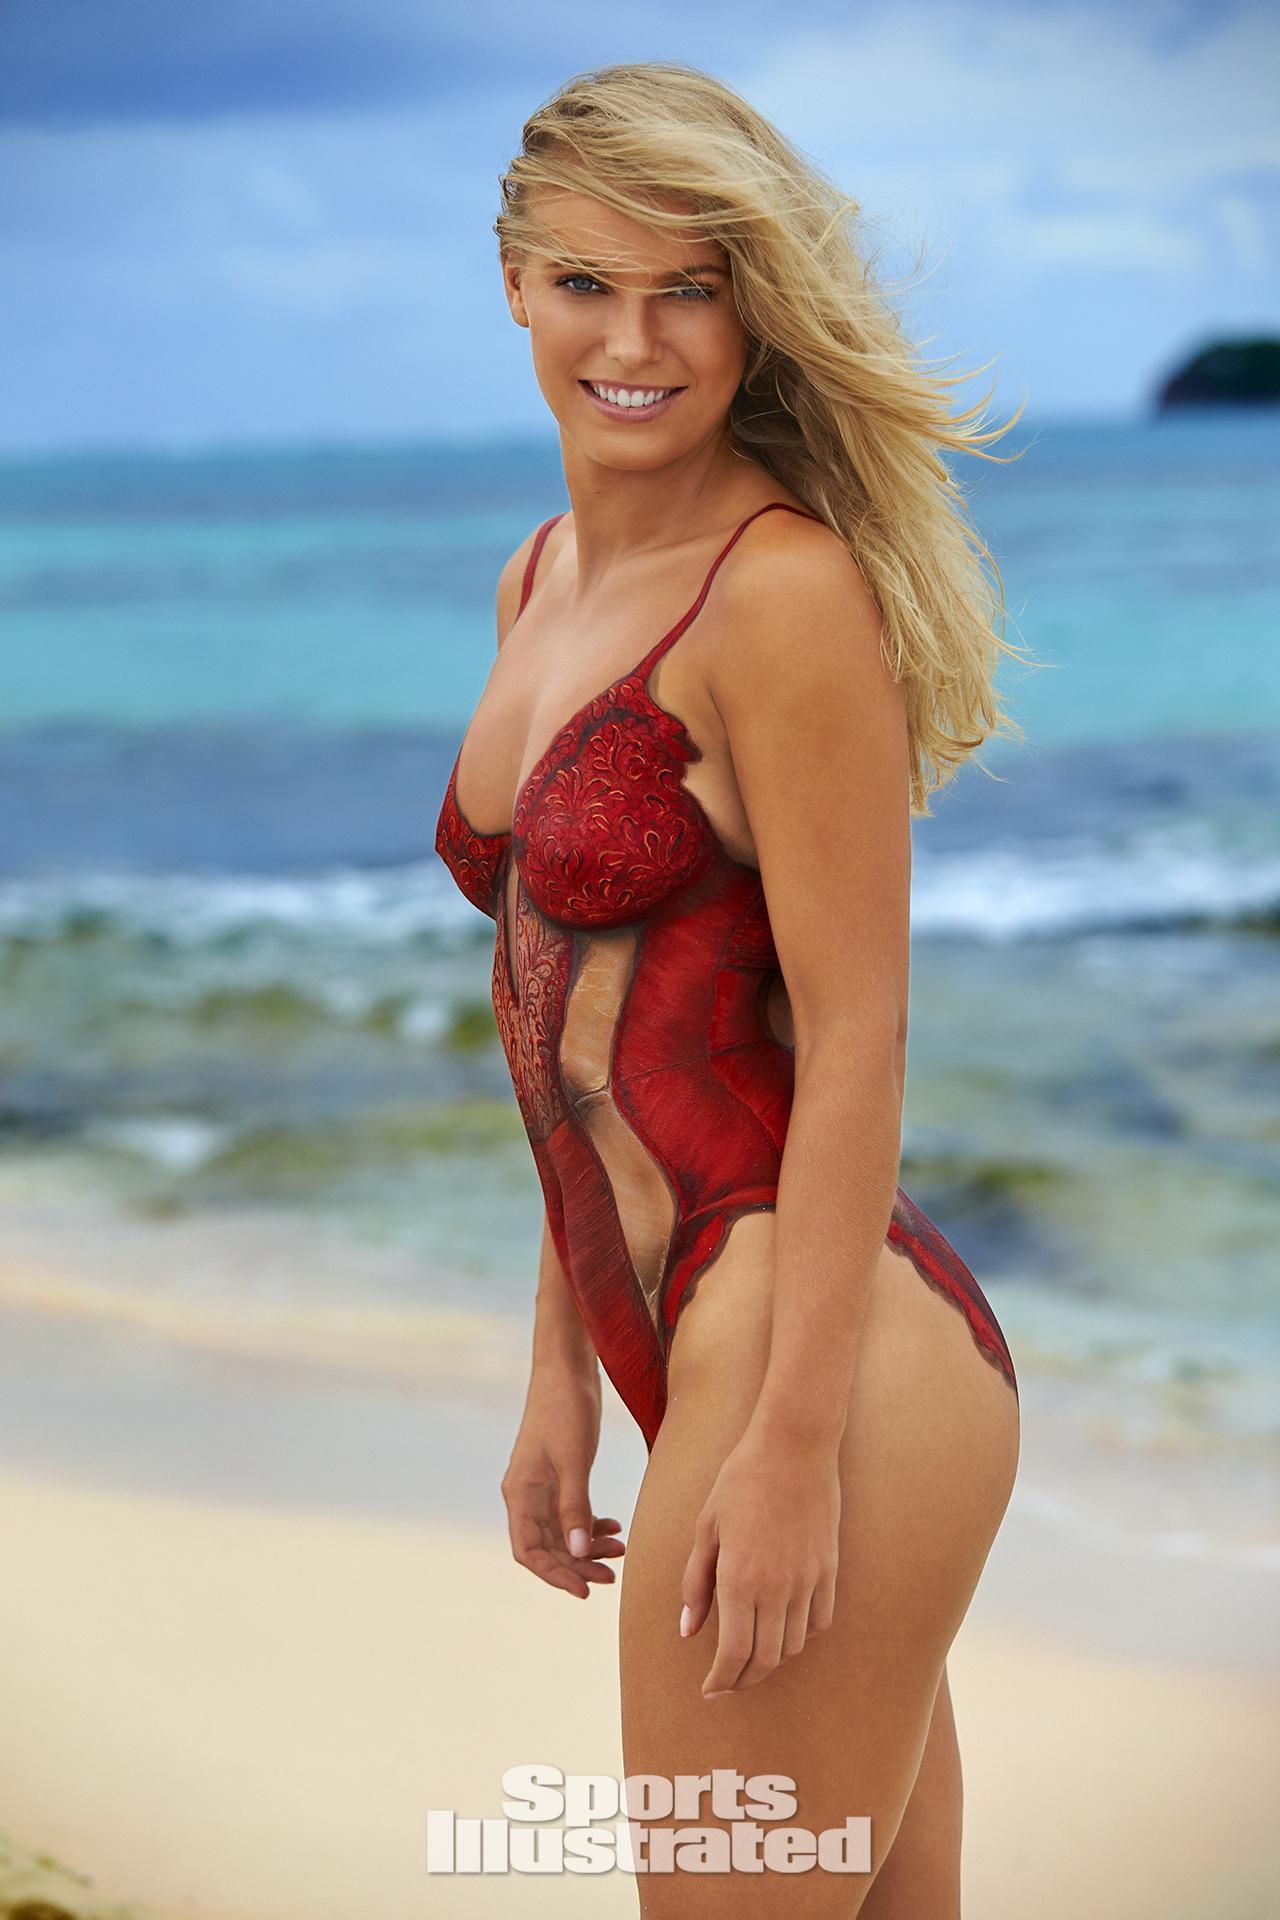 ... ten GIFs show exactly why we're obsessed with Caroline Wozniacki